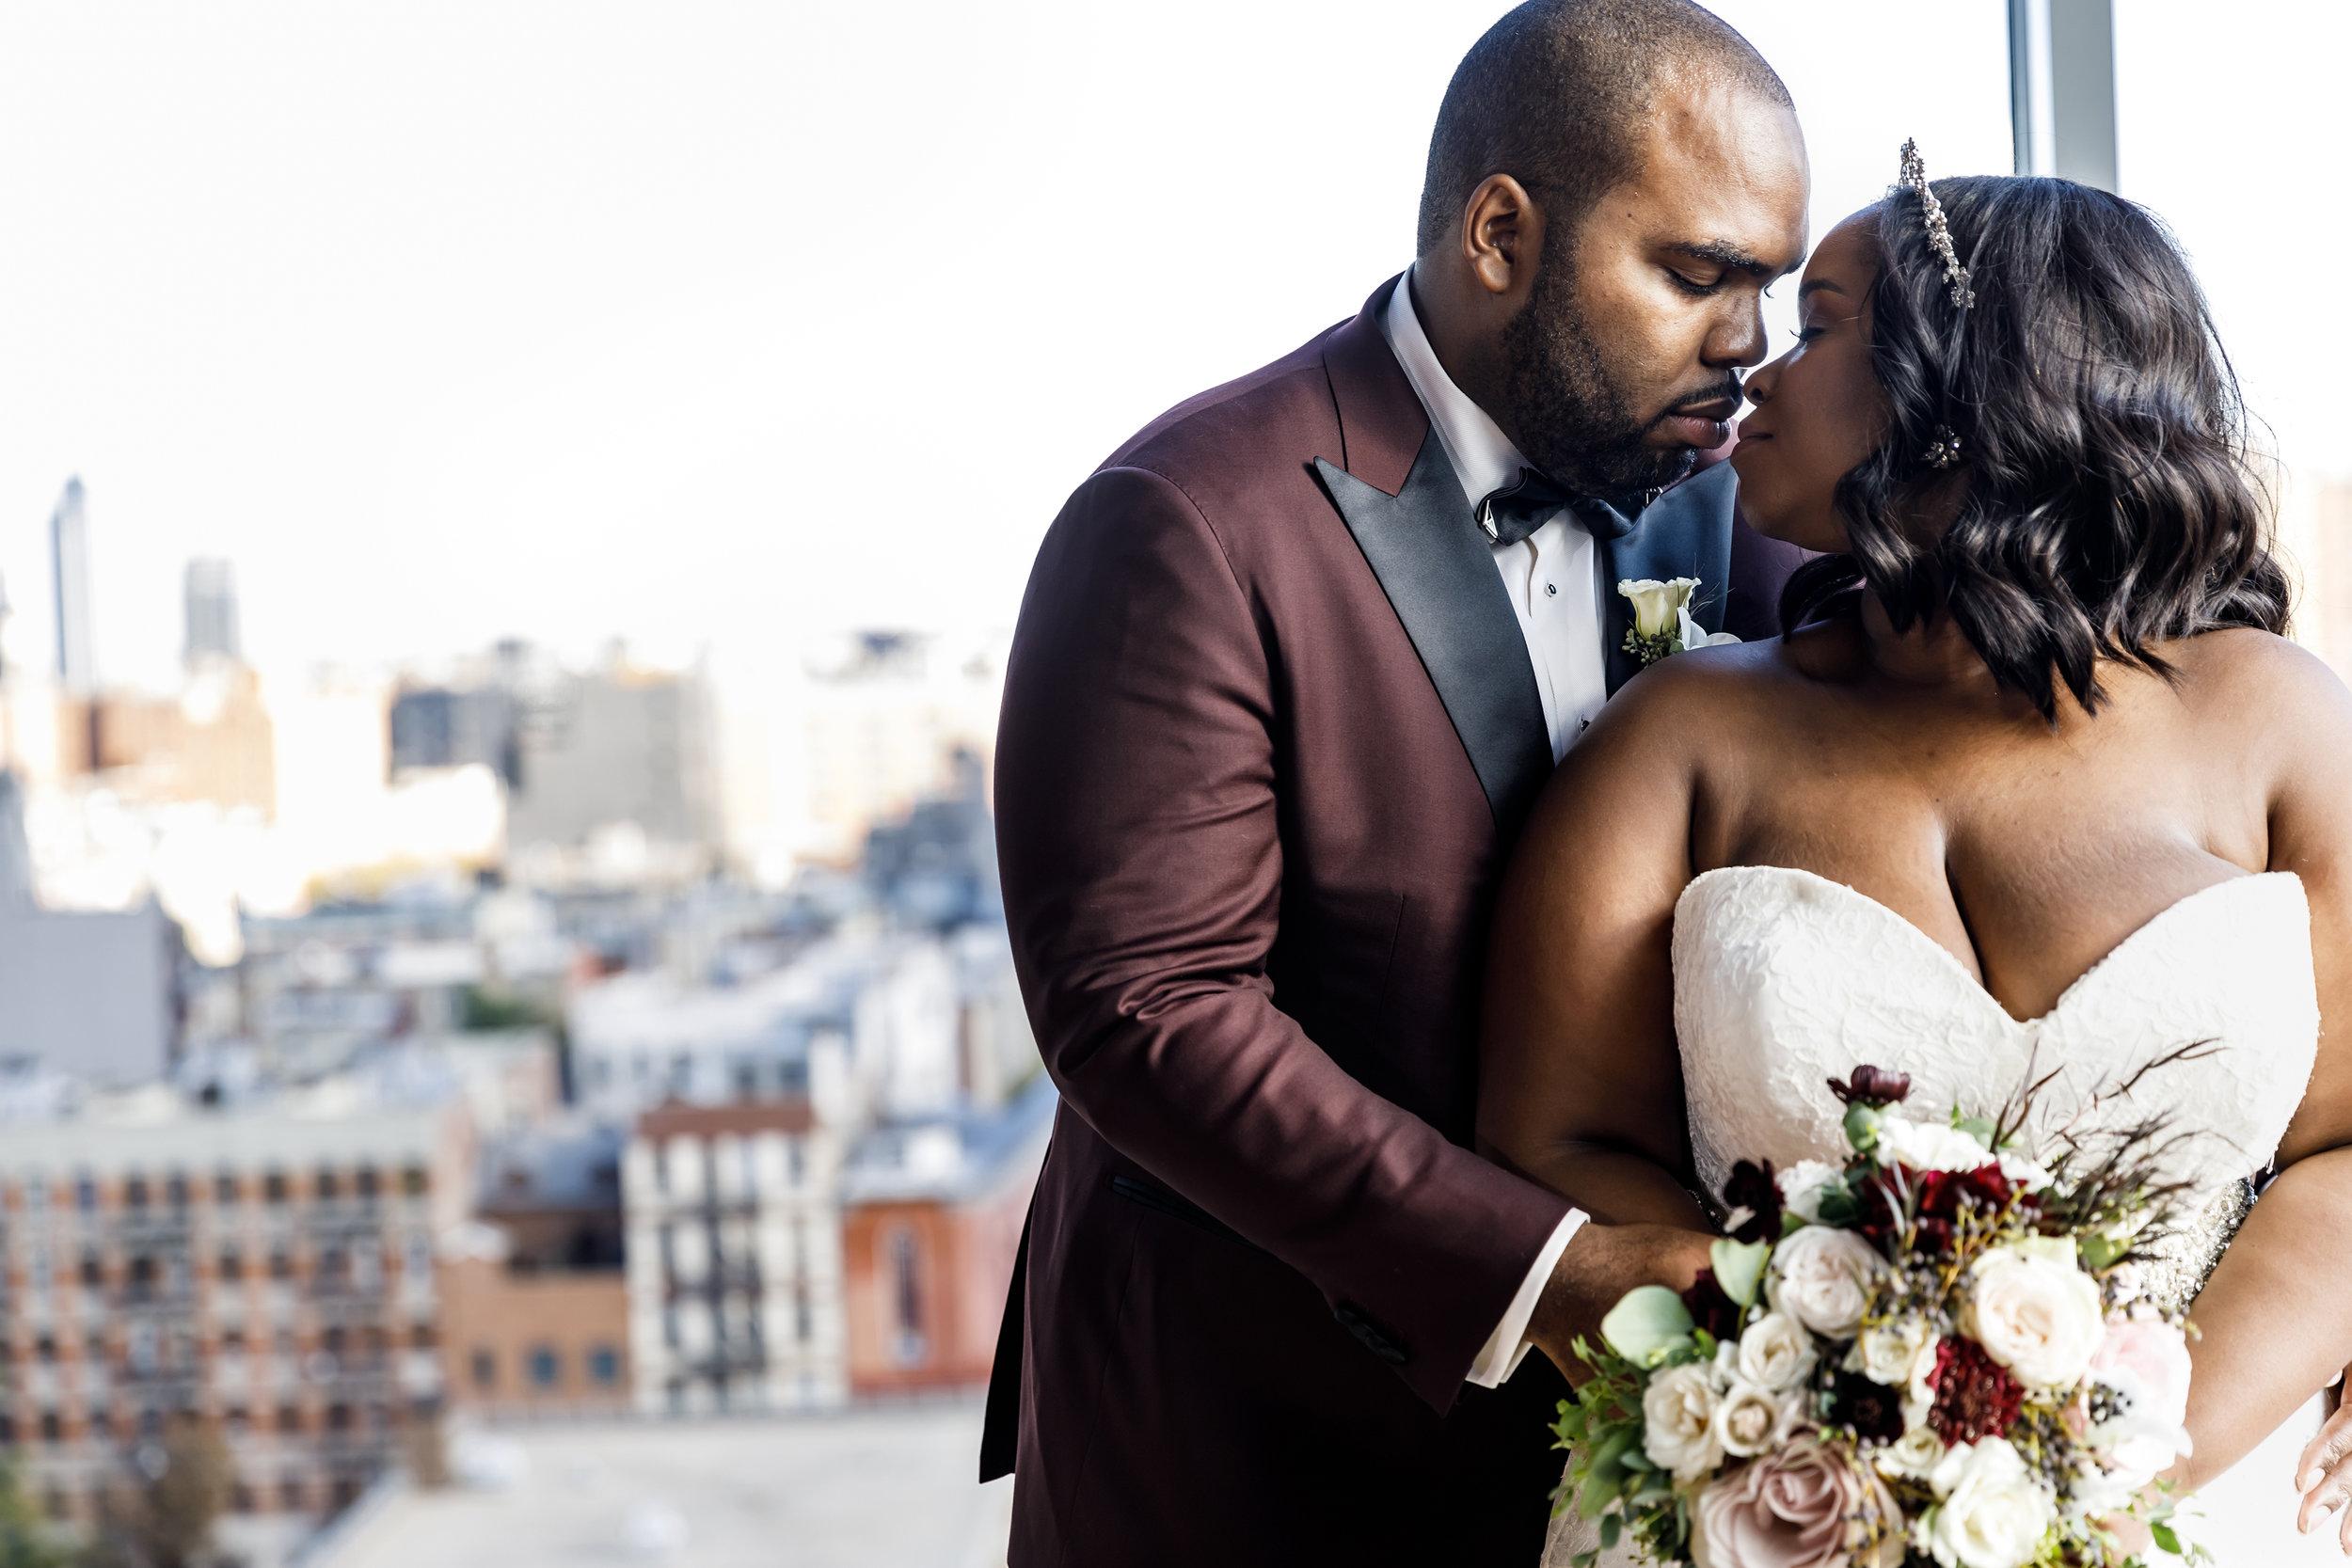 victorious-events-nyc-027-yanique-rondel-greenpoint-loft-wedding-amy-anaiz.jpg